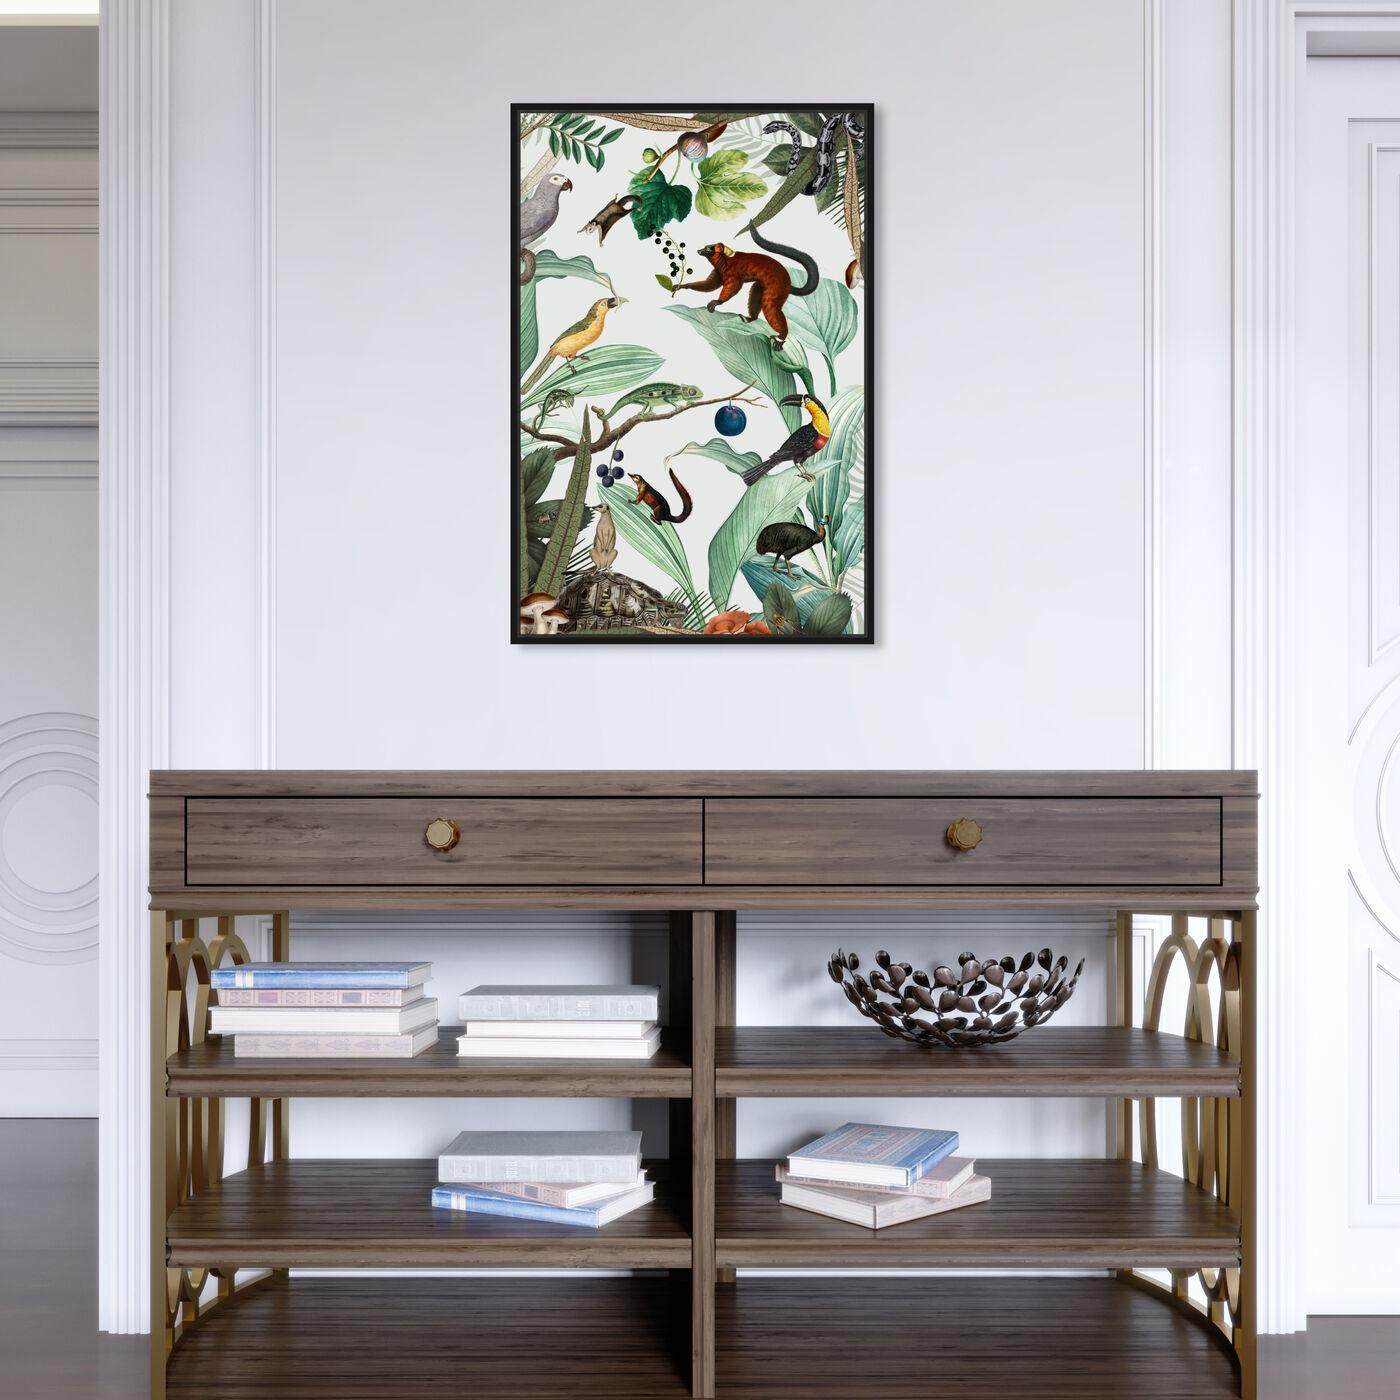 Hanging view of La Jungla del Fruto featuring animals and birds art.